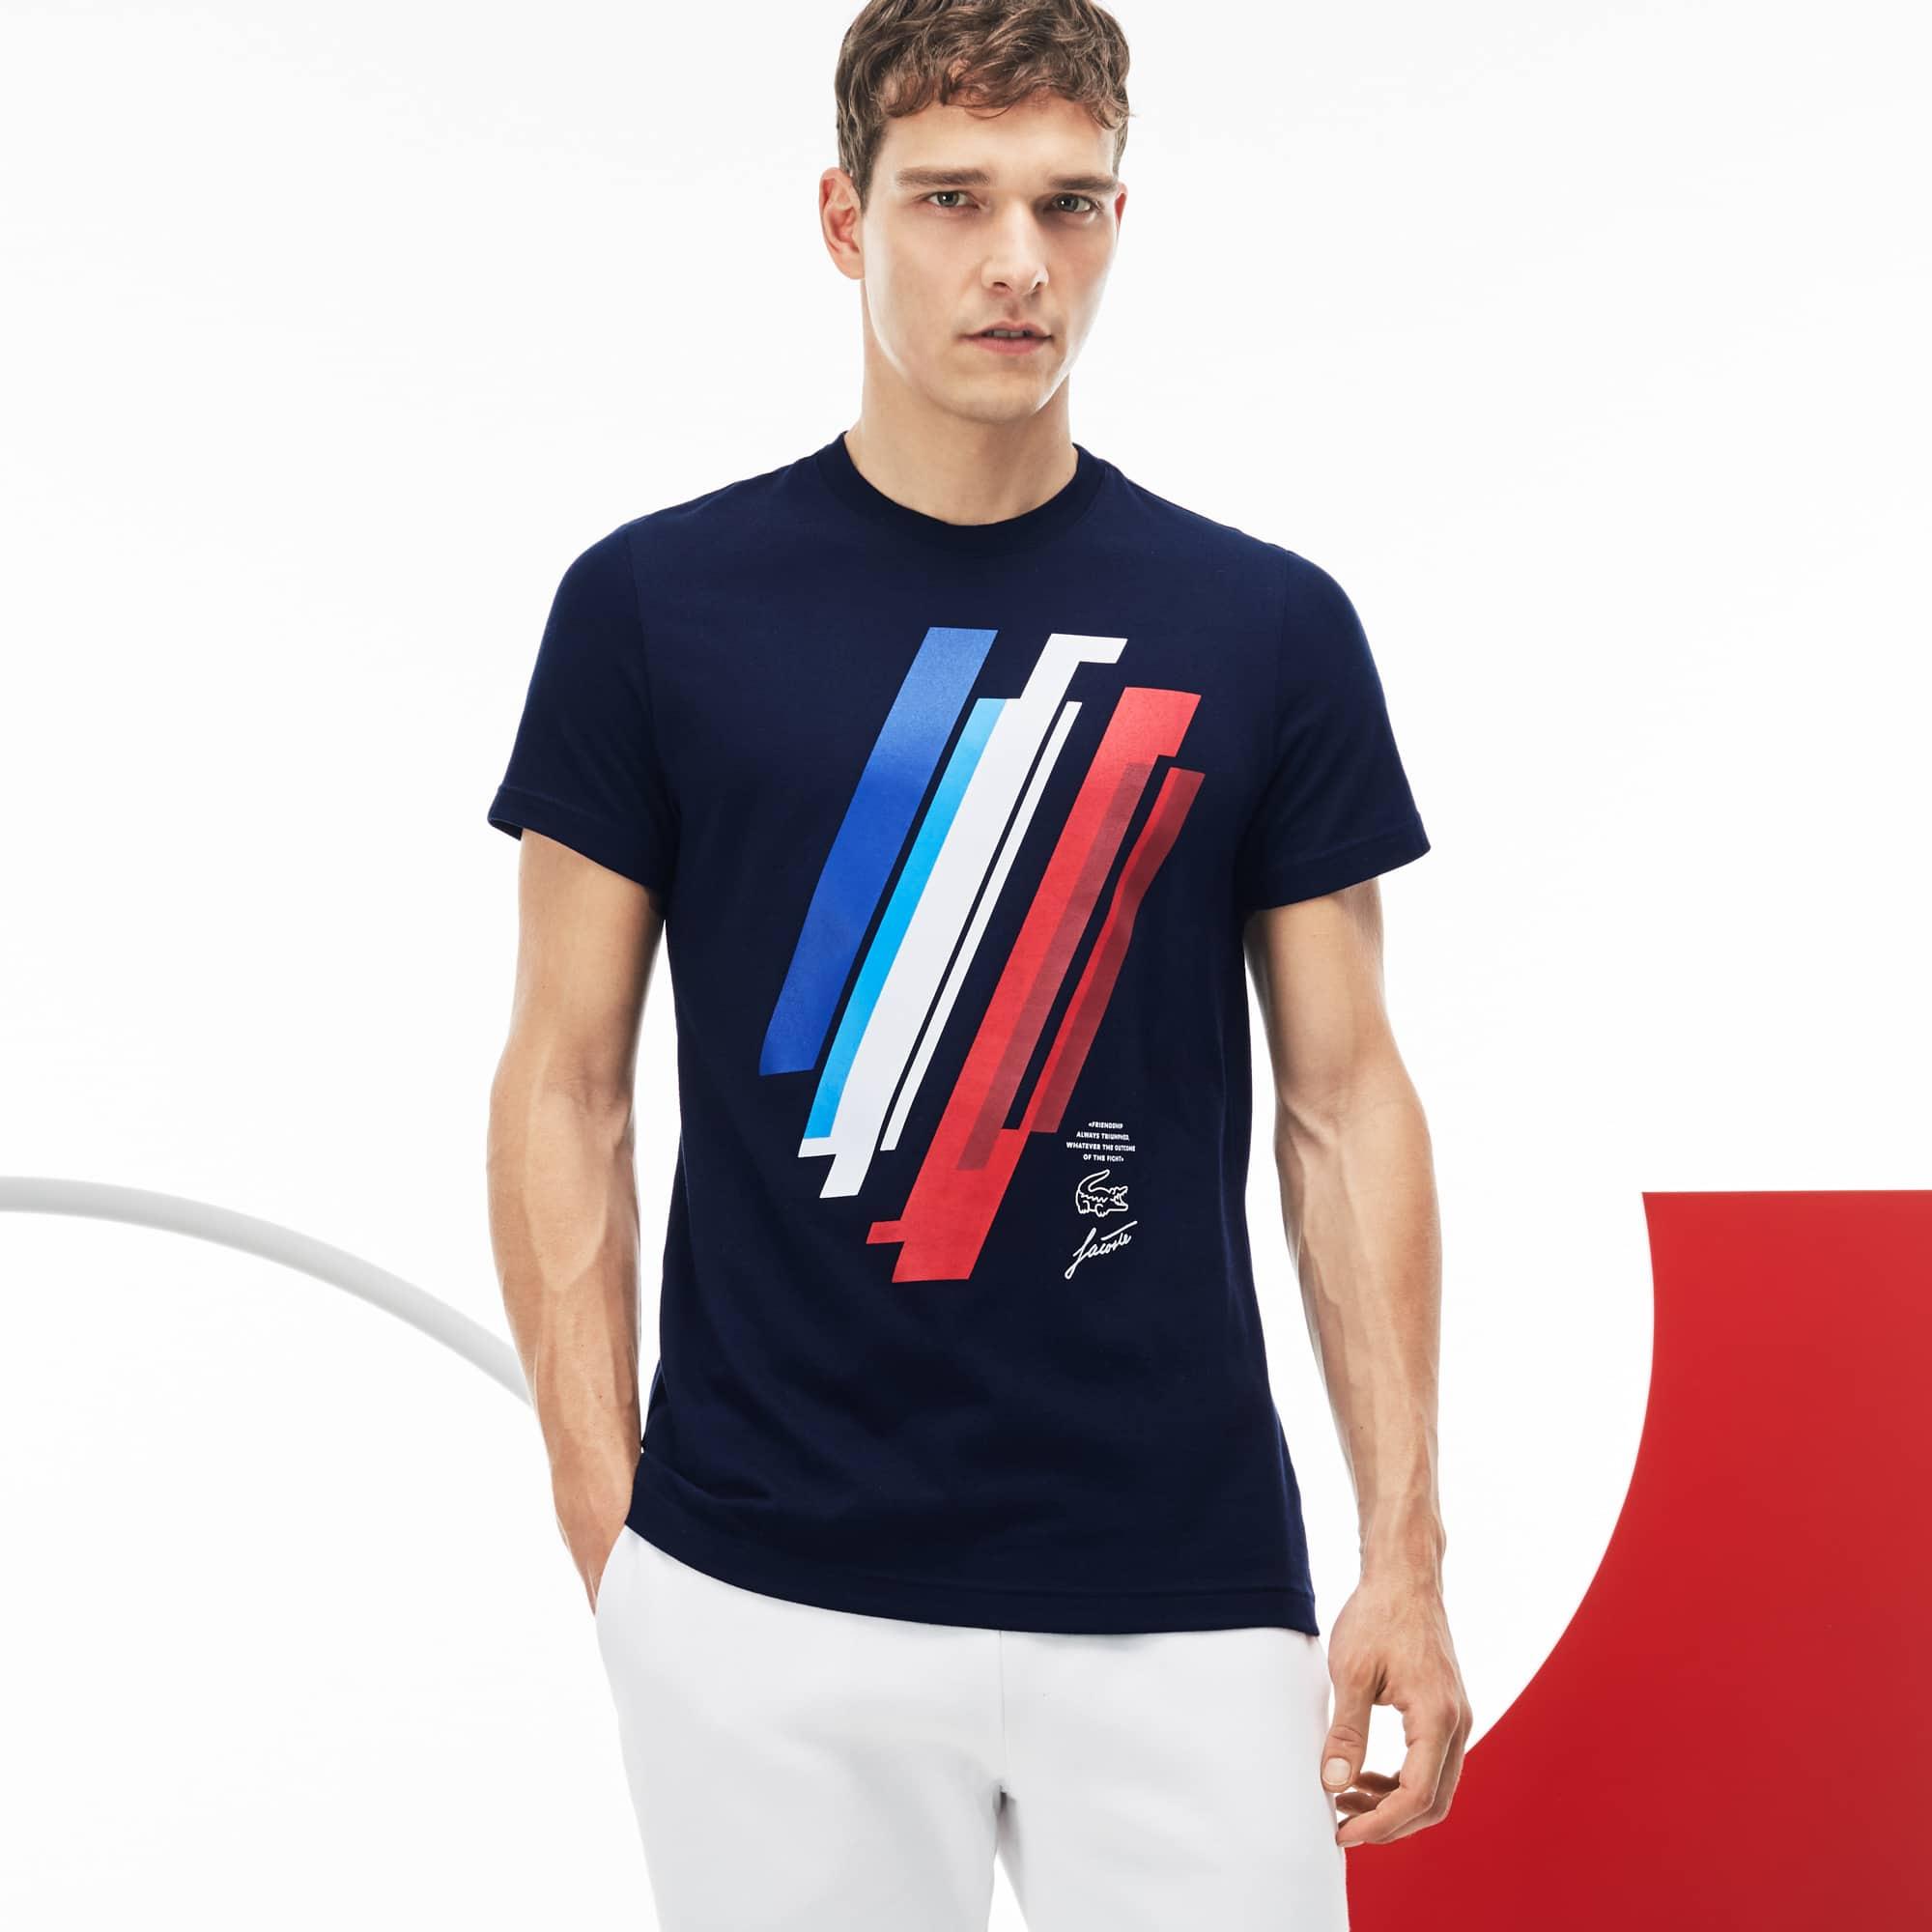 Men's Lacoste SPORT COLLECTION TRICOLORE Edition Print Jersey T-shirt